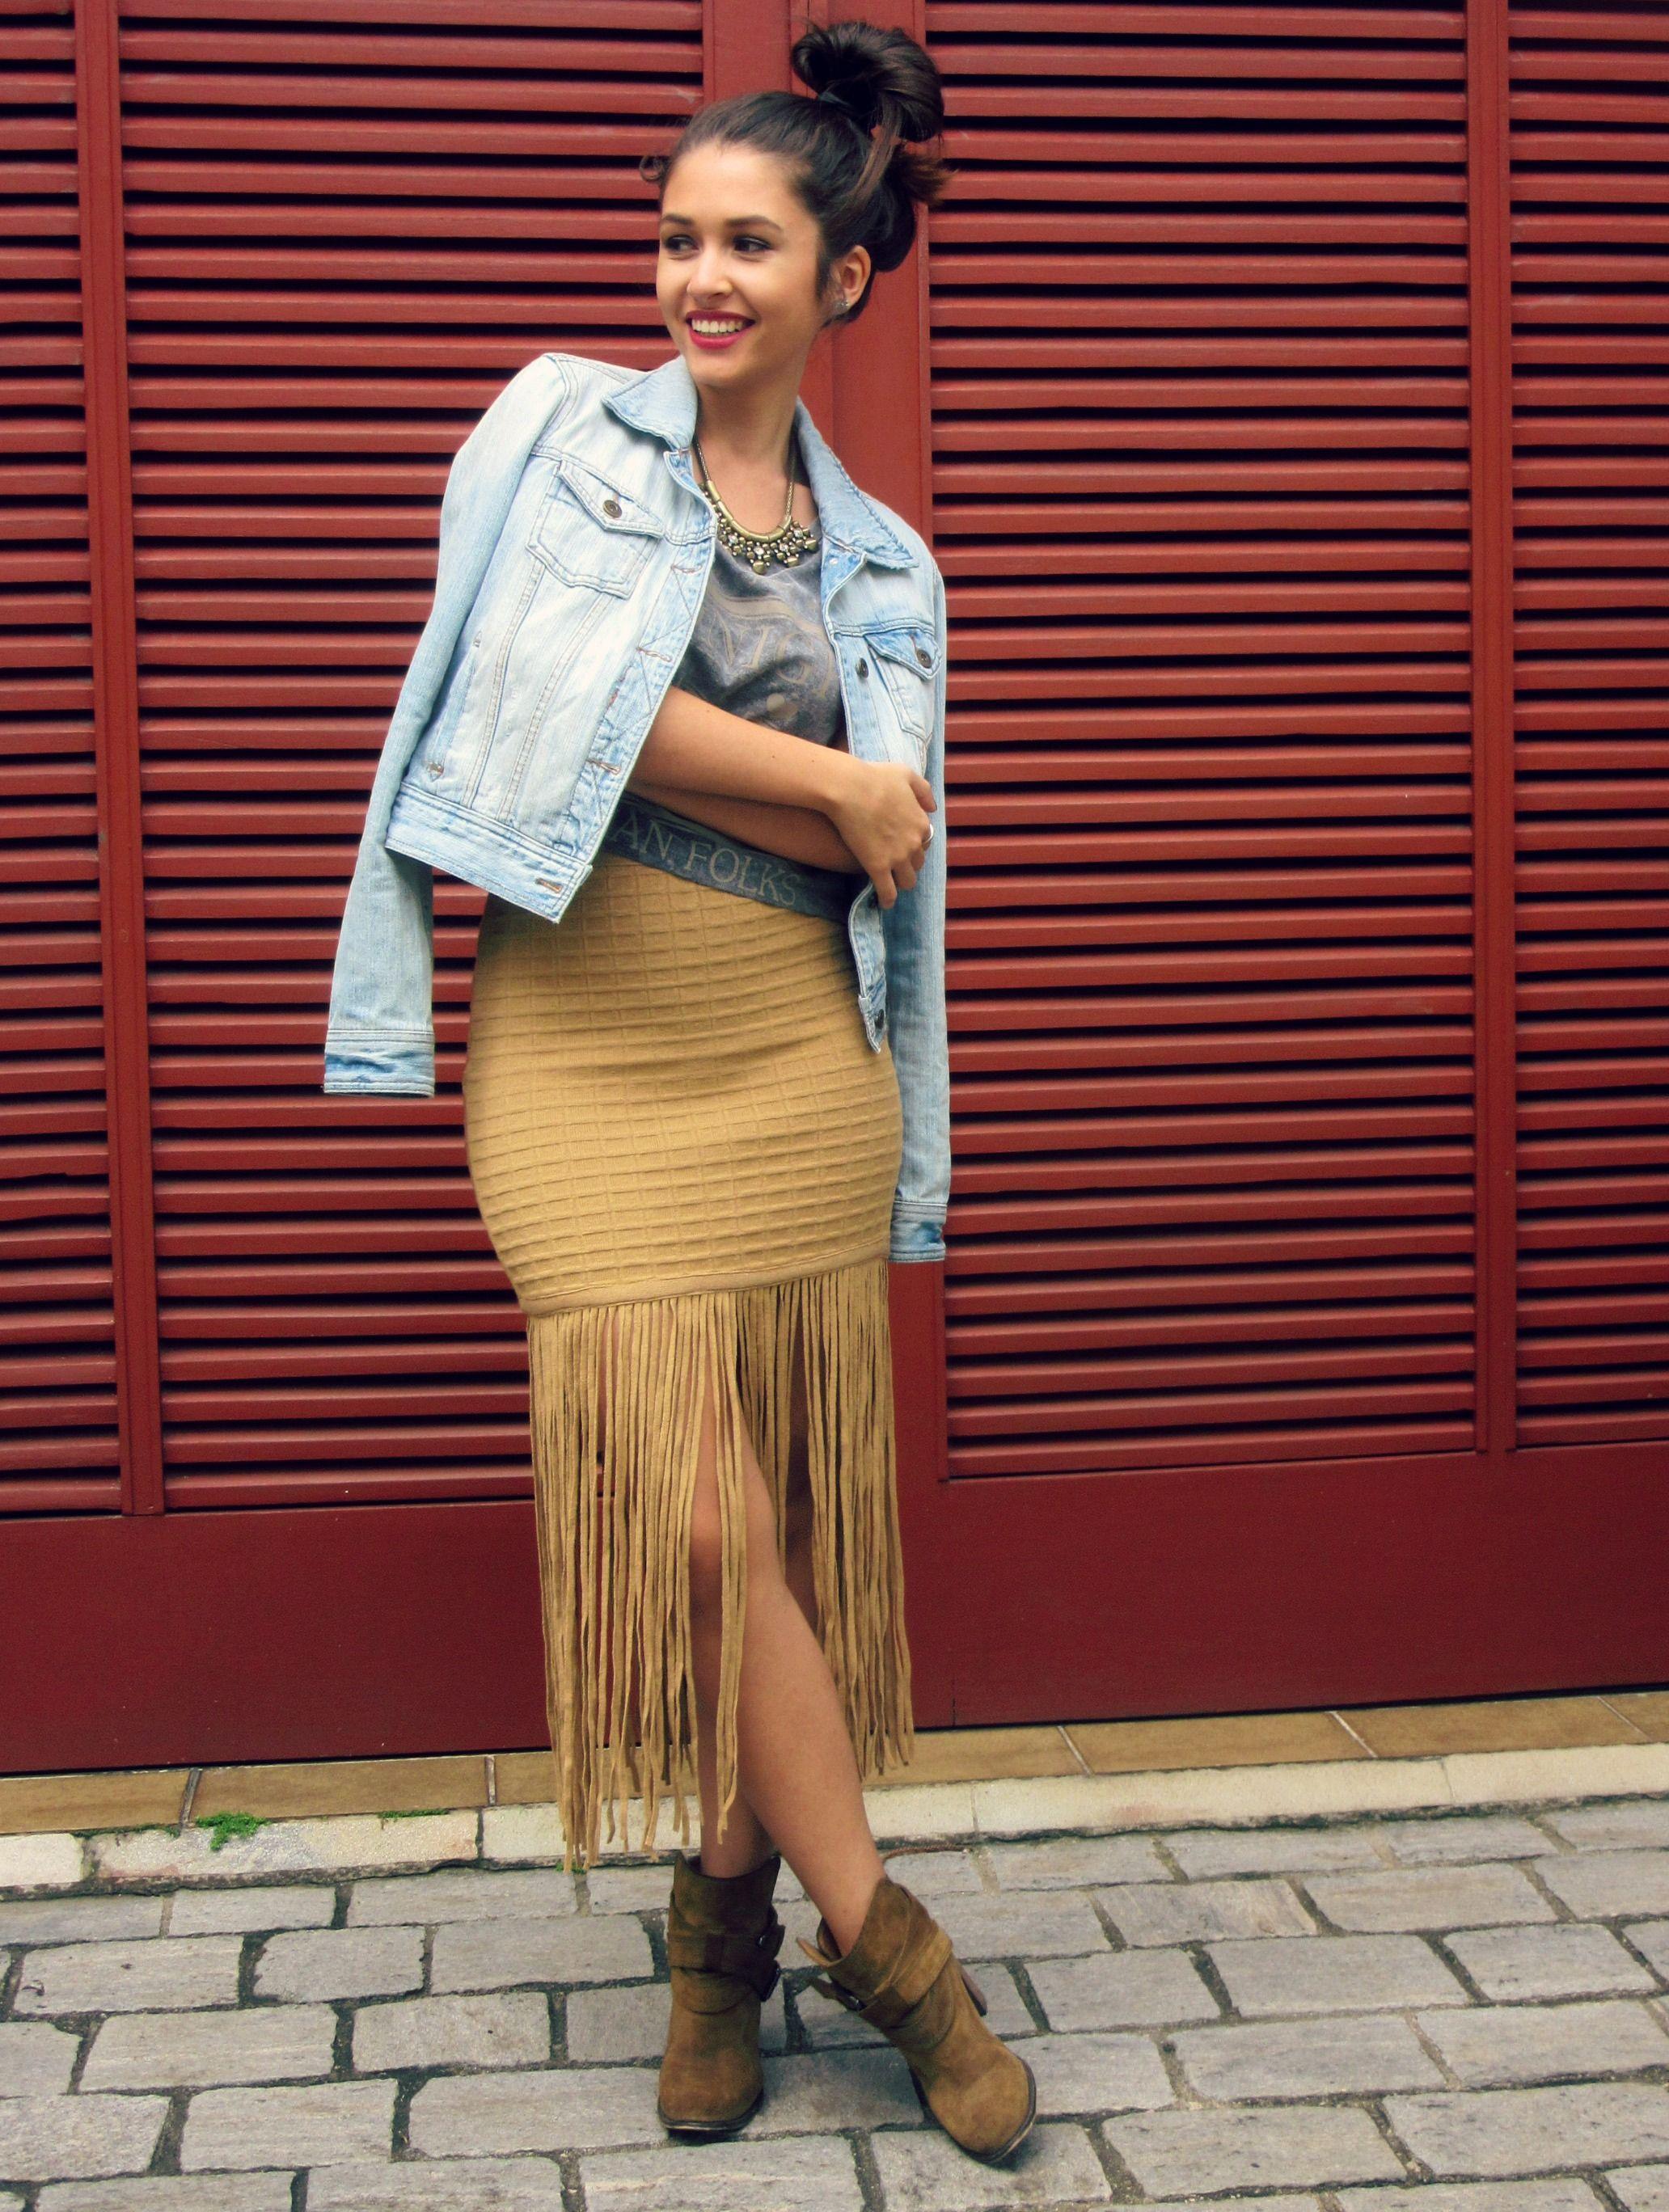 Fringe kint skirt, denim jacket and zara boots. #ootd Outifit - Look com saia de franjas, jaqueta jeans e ankle boots.